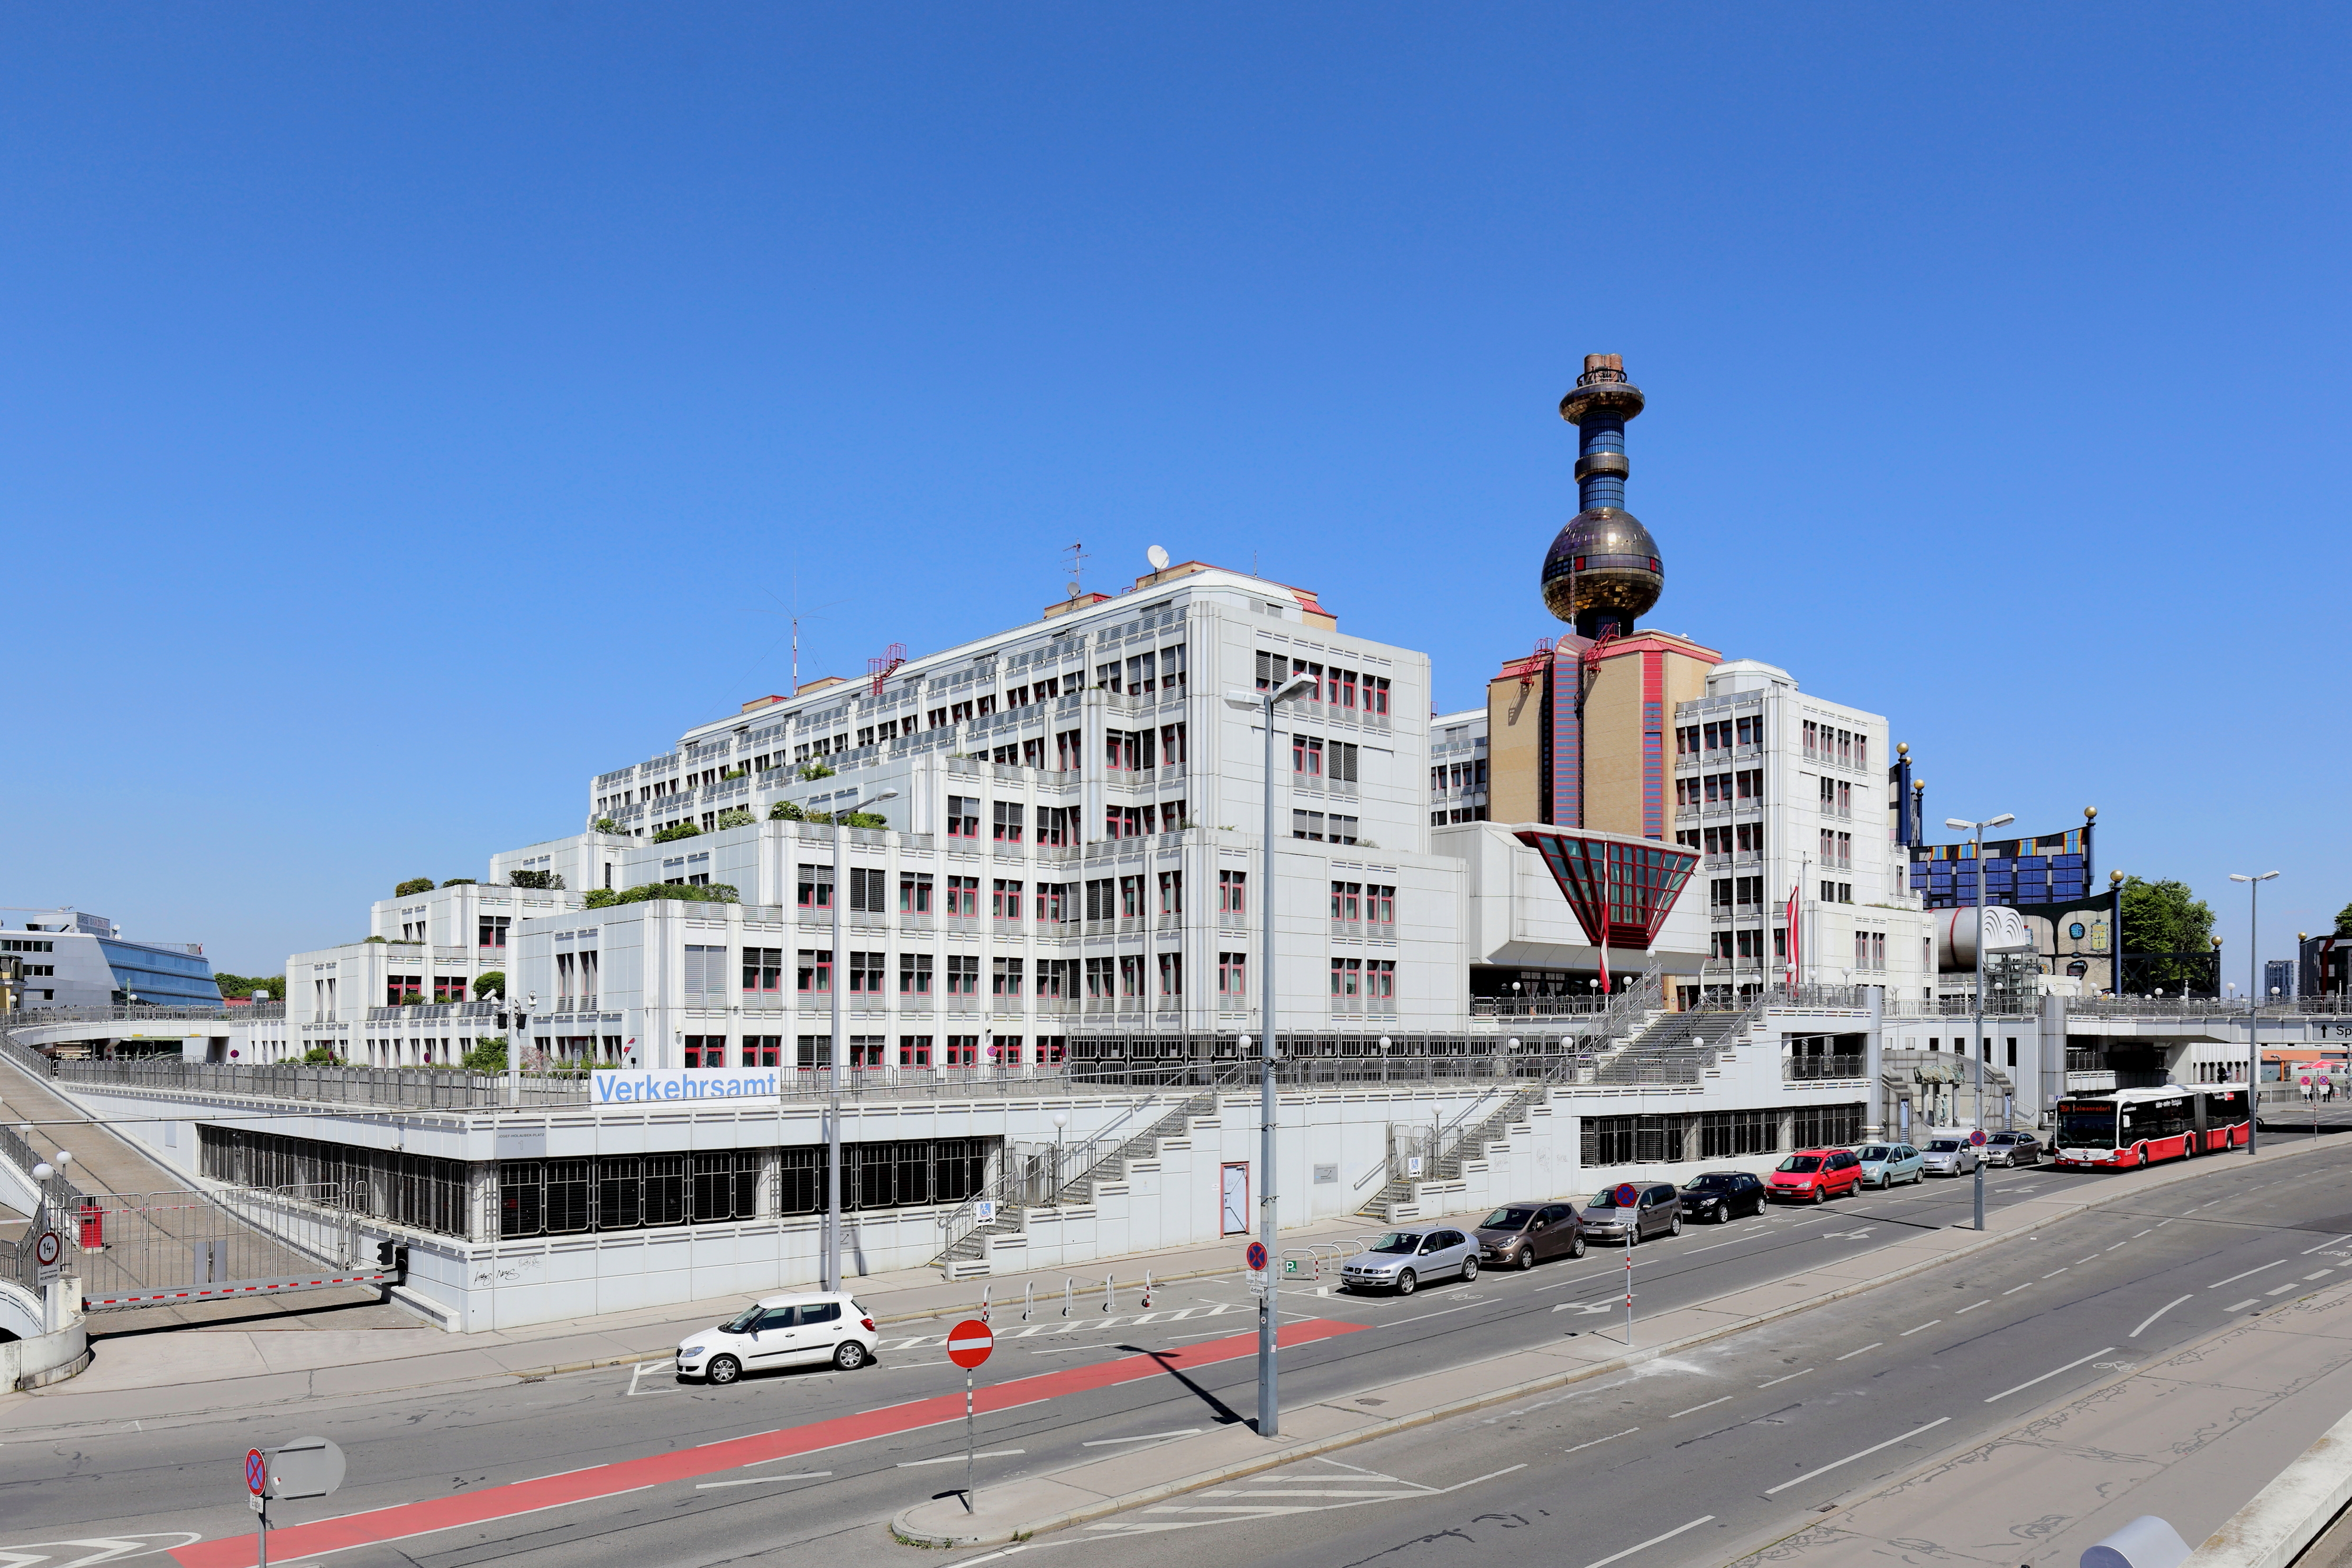 Filewien Bundesgebäude Verkehrsamtjpg Wikimedia Commons